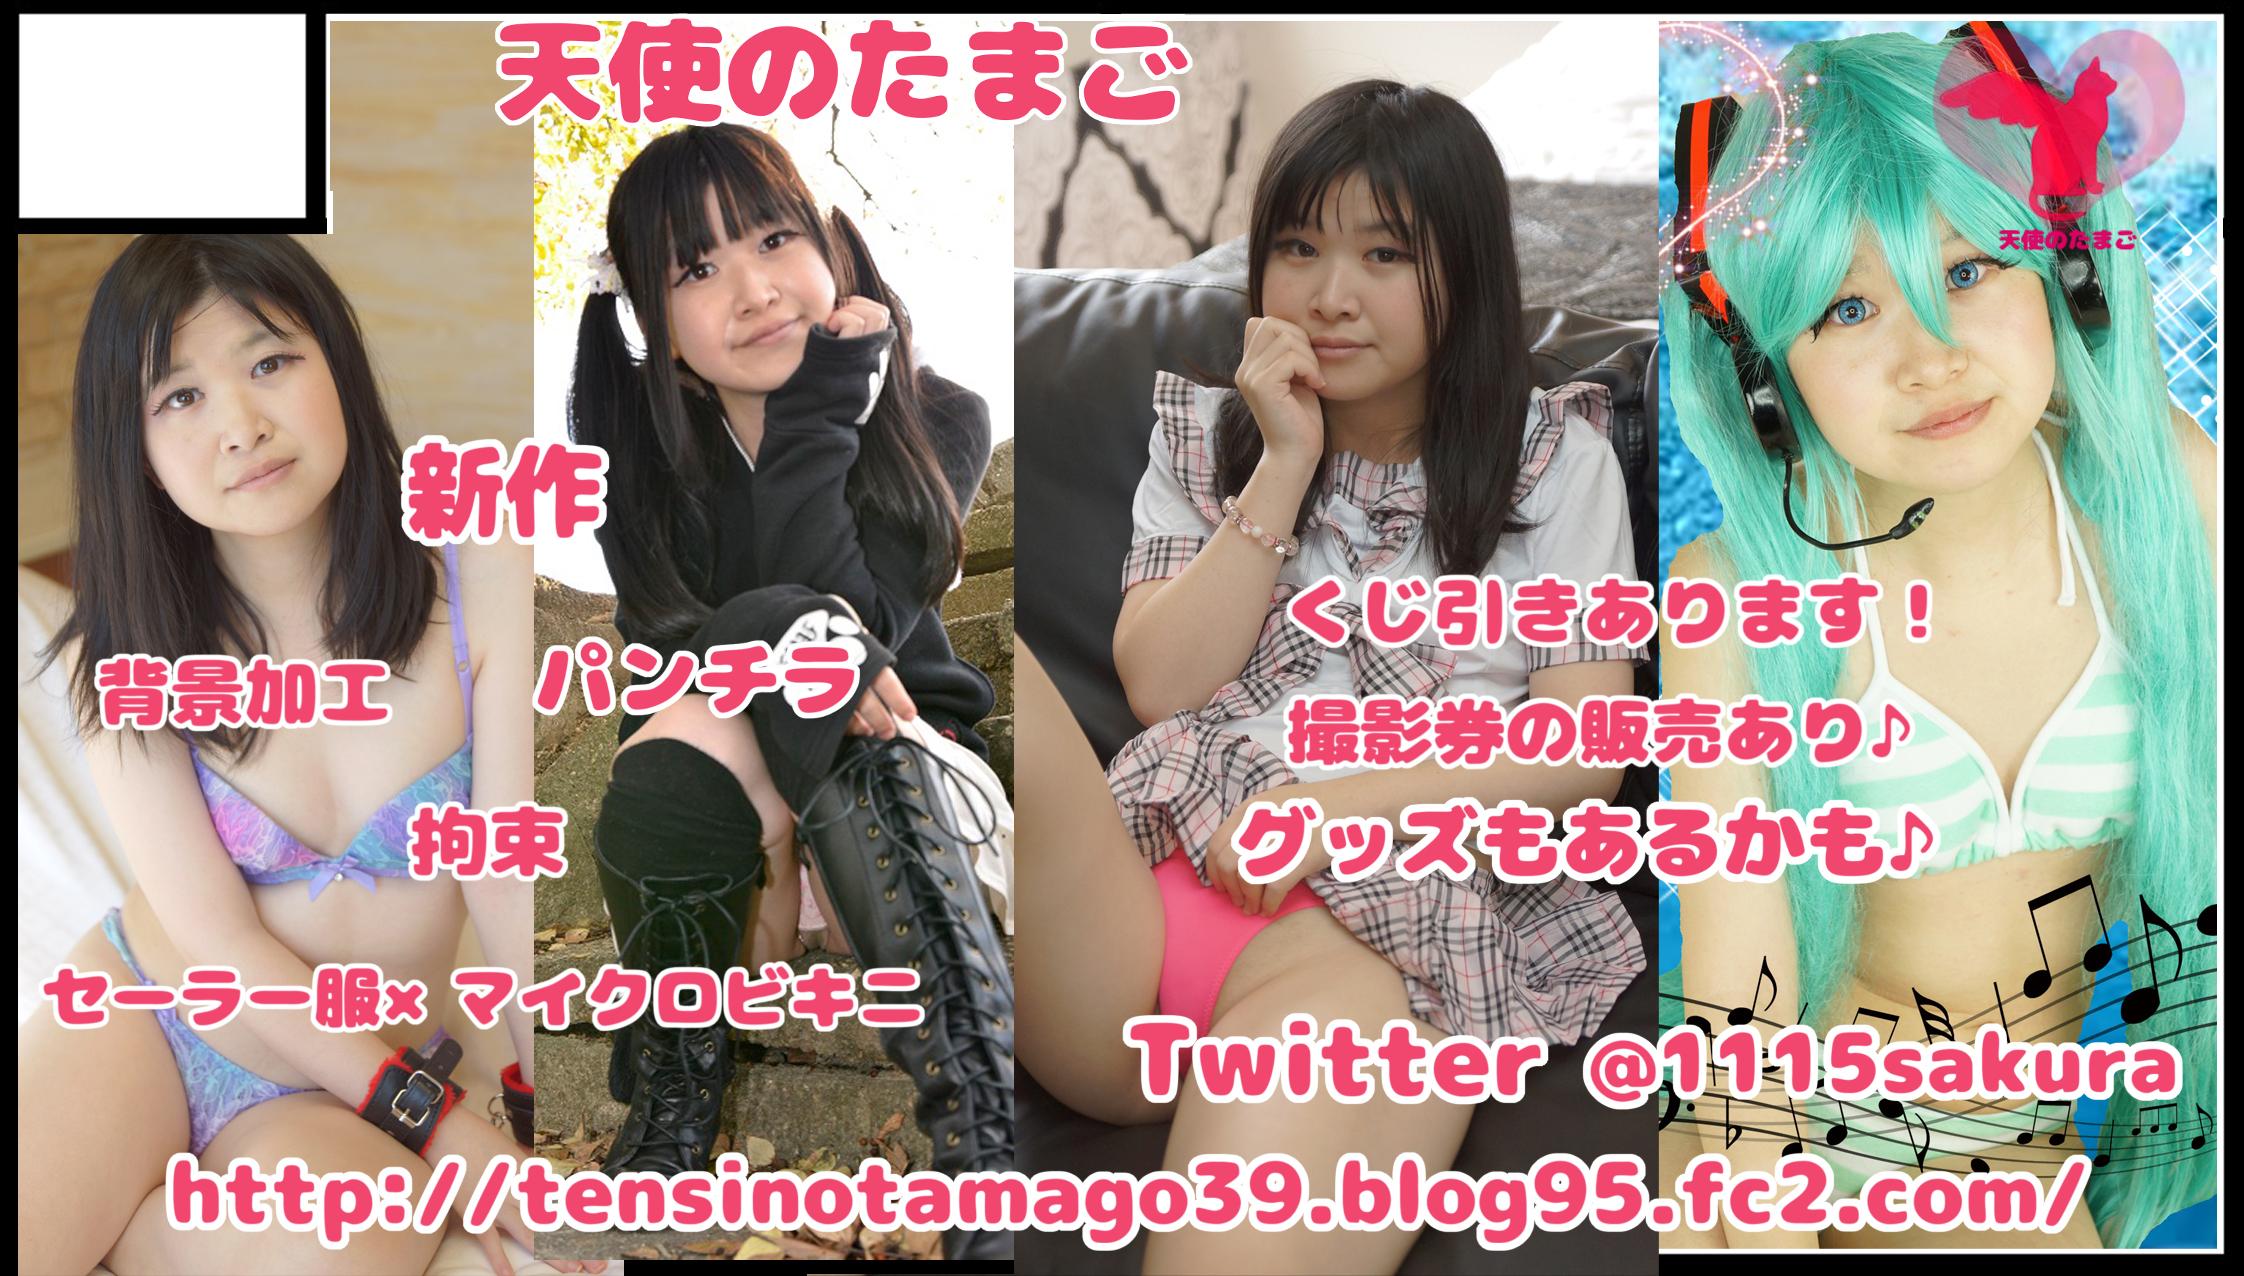 tensinotamago_201505100049351ce.jpg